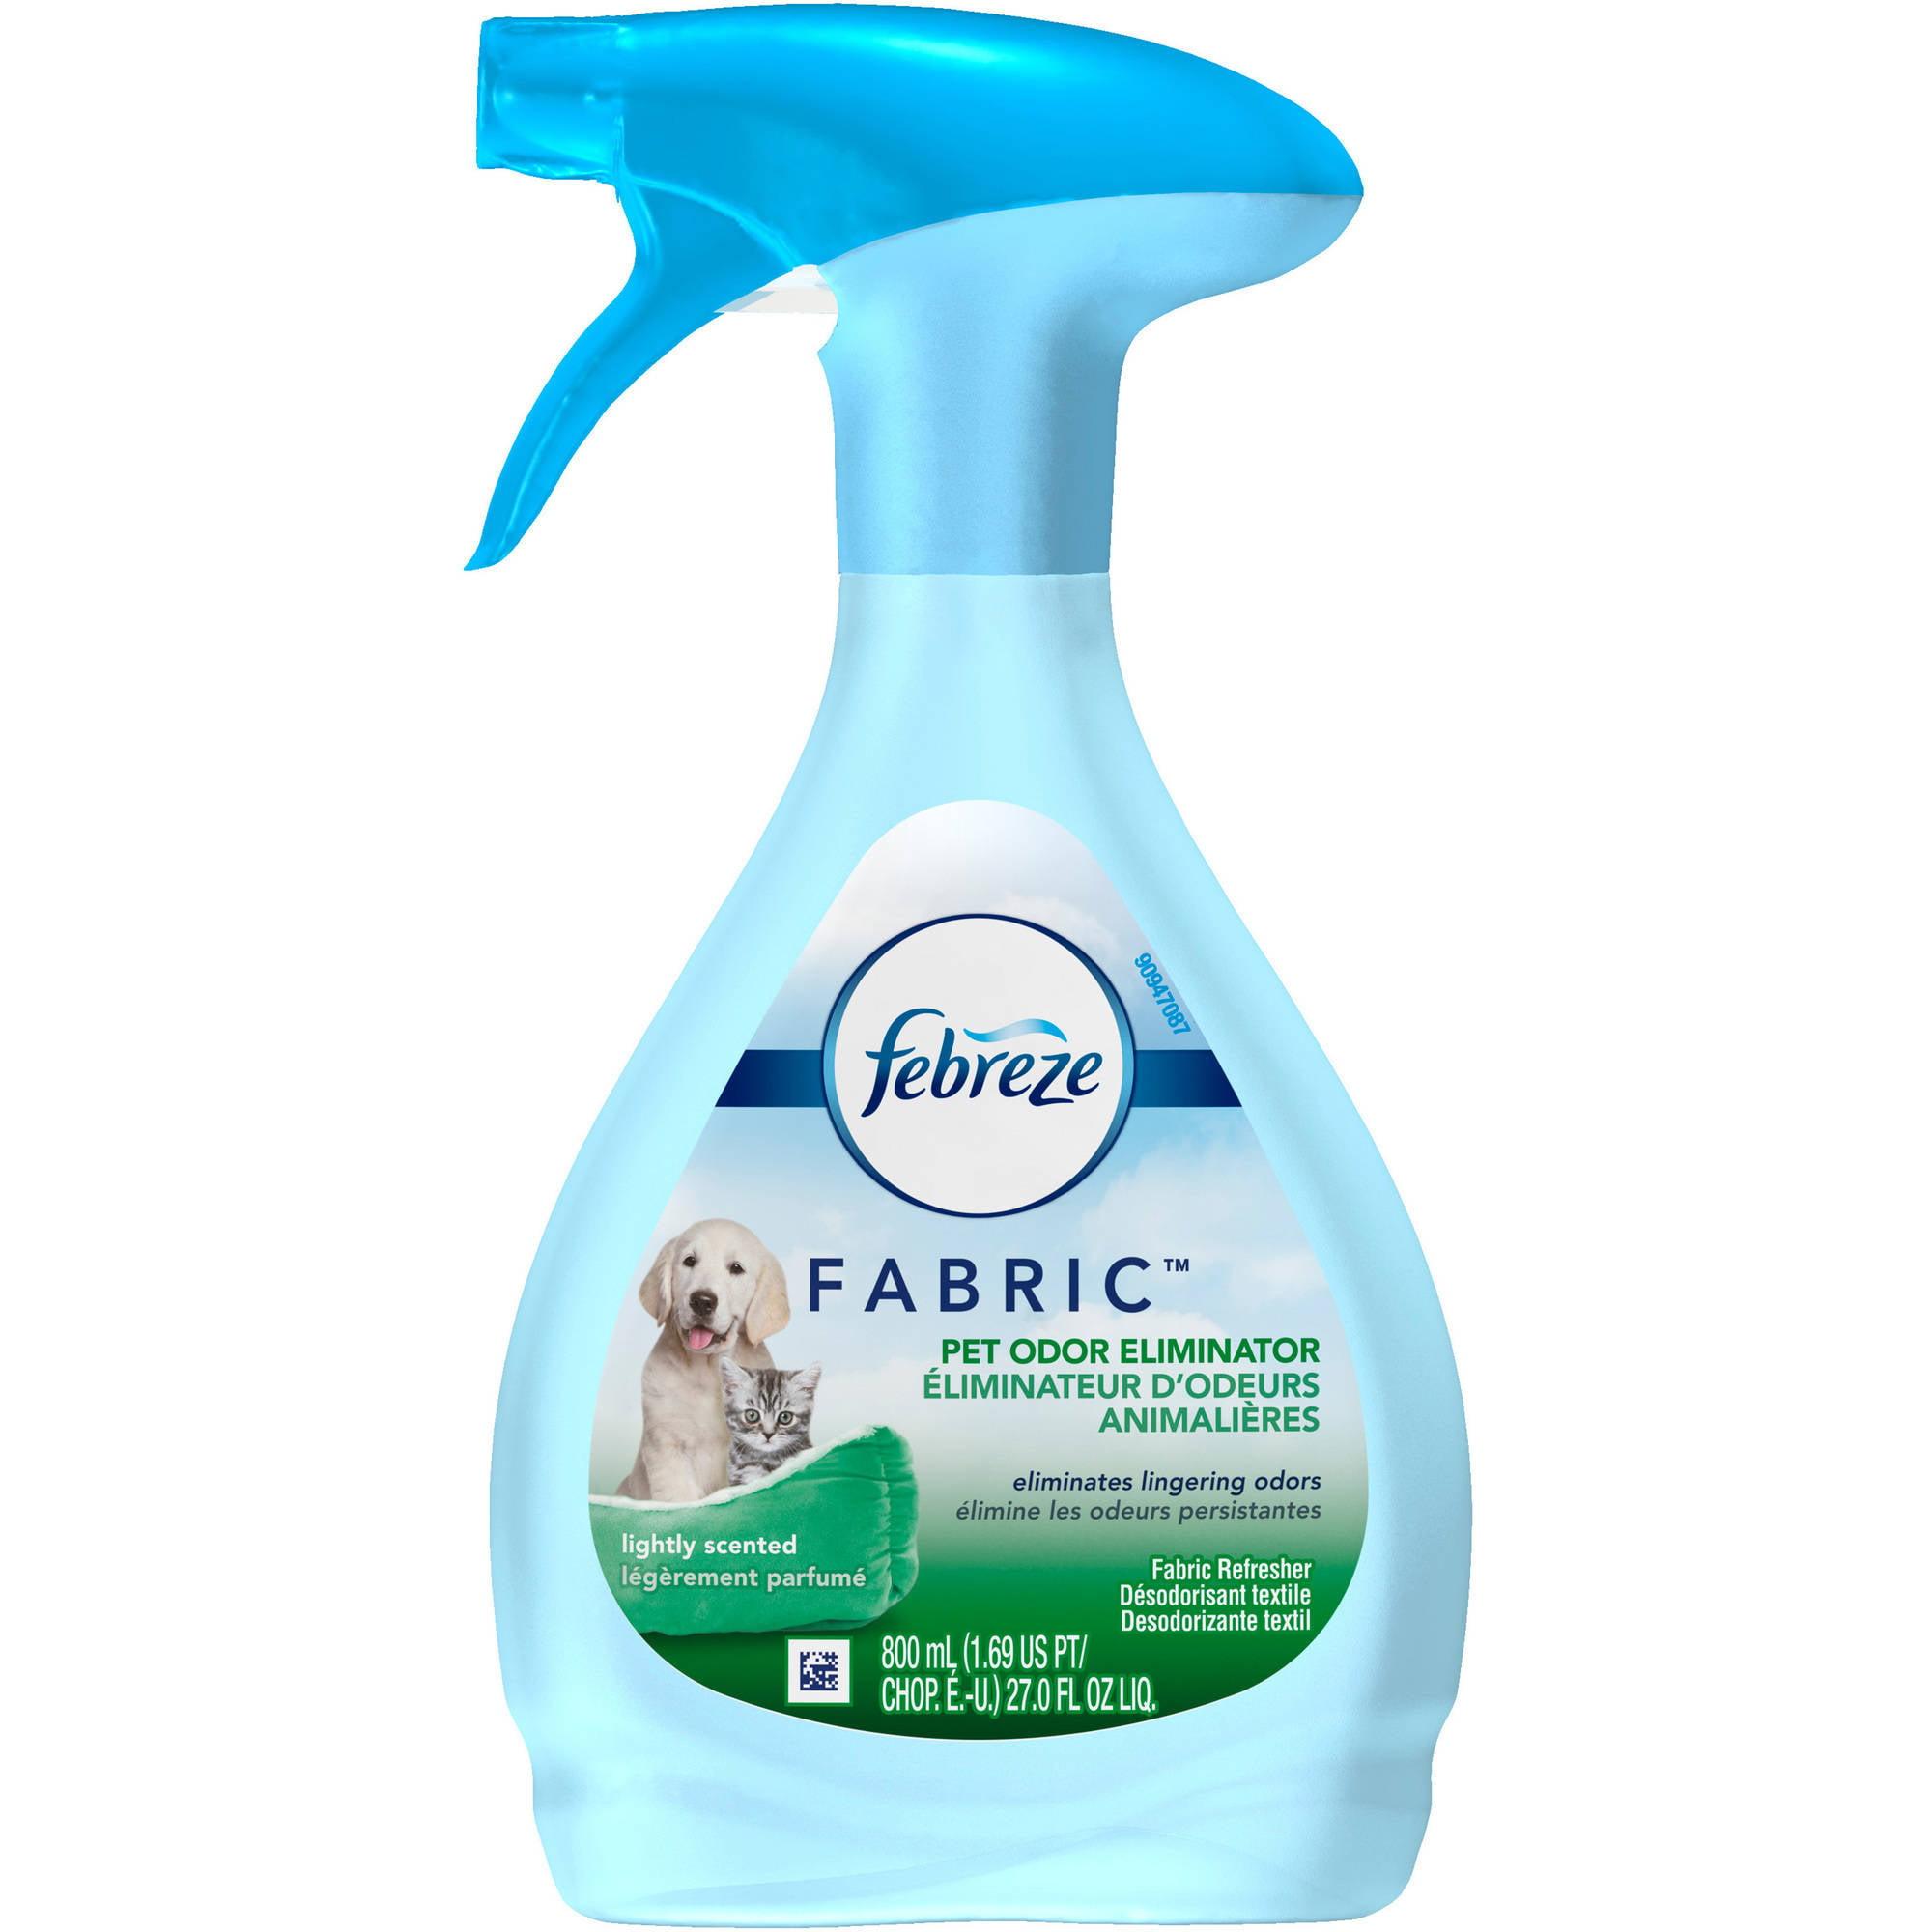 Febreze Lightly Scented Pet Odor Eliminator Fabric Refresher, 27 fl oz